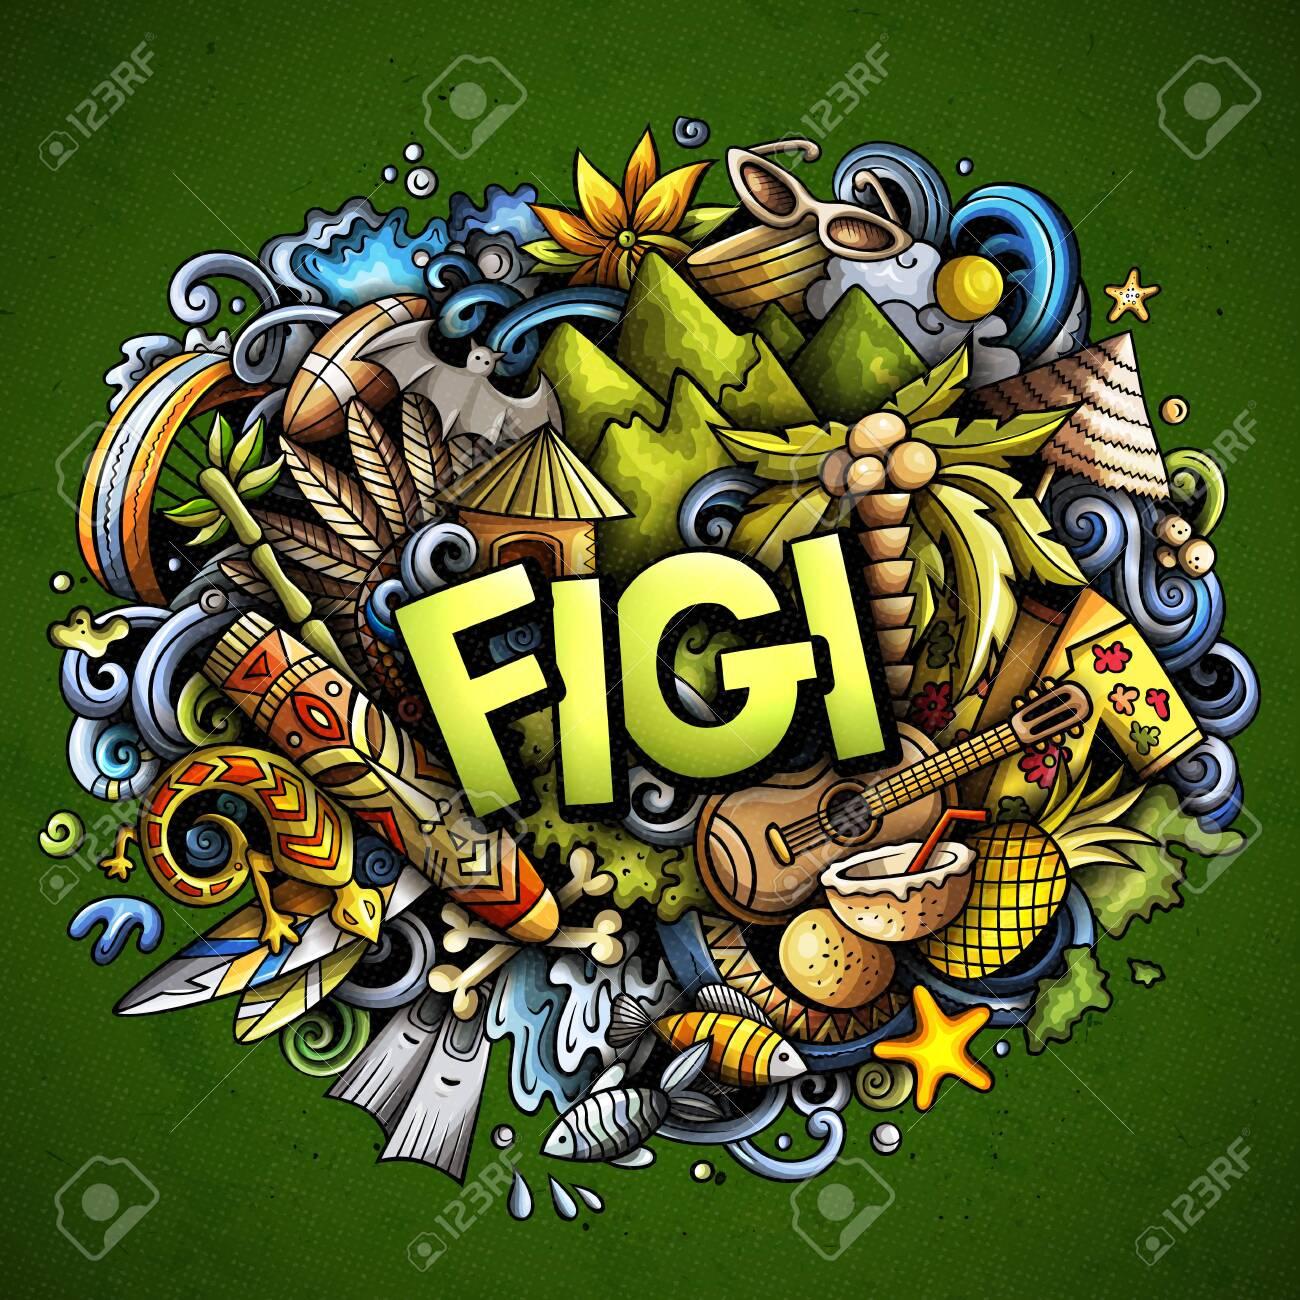 Figi hand drawn cartoon doodles illustration. Funny travel design. - 141514494